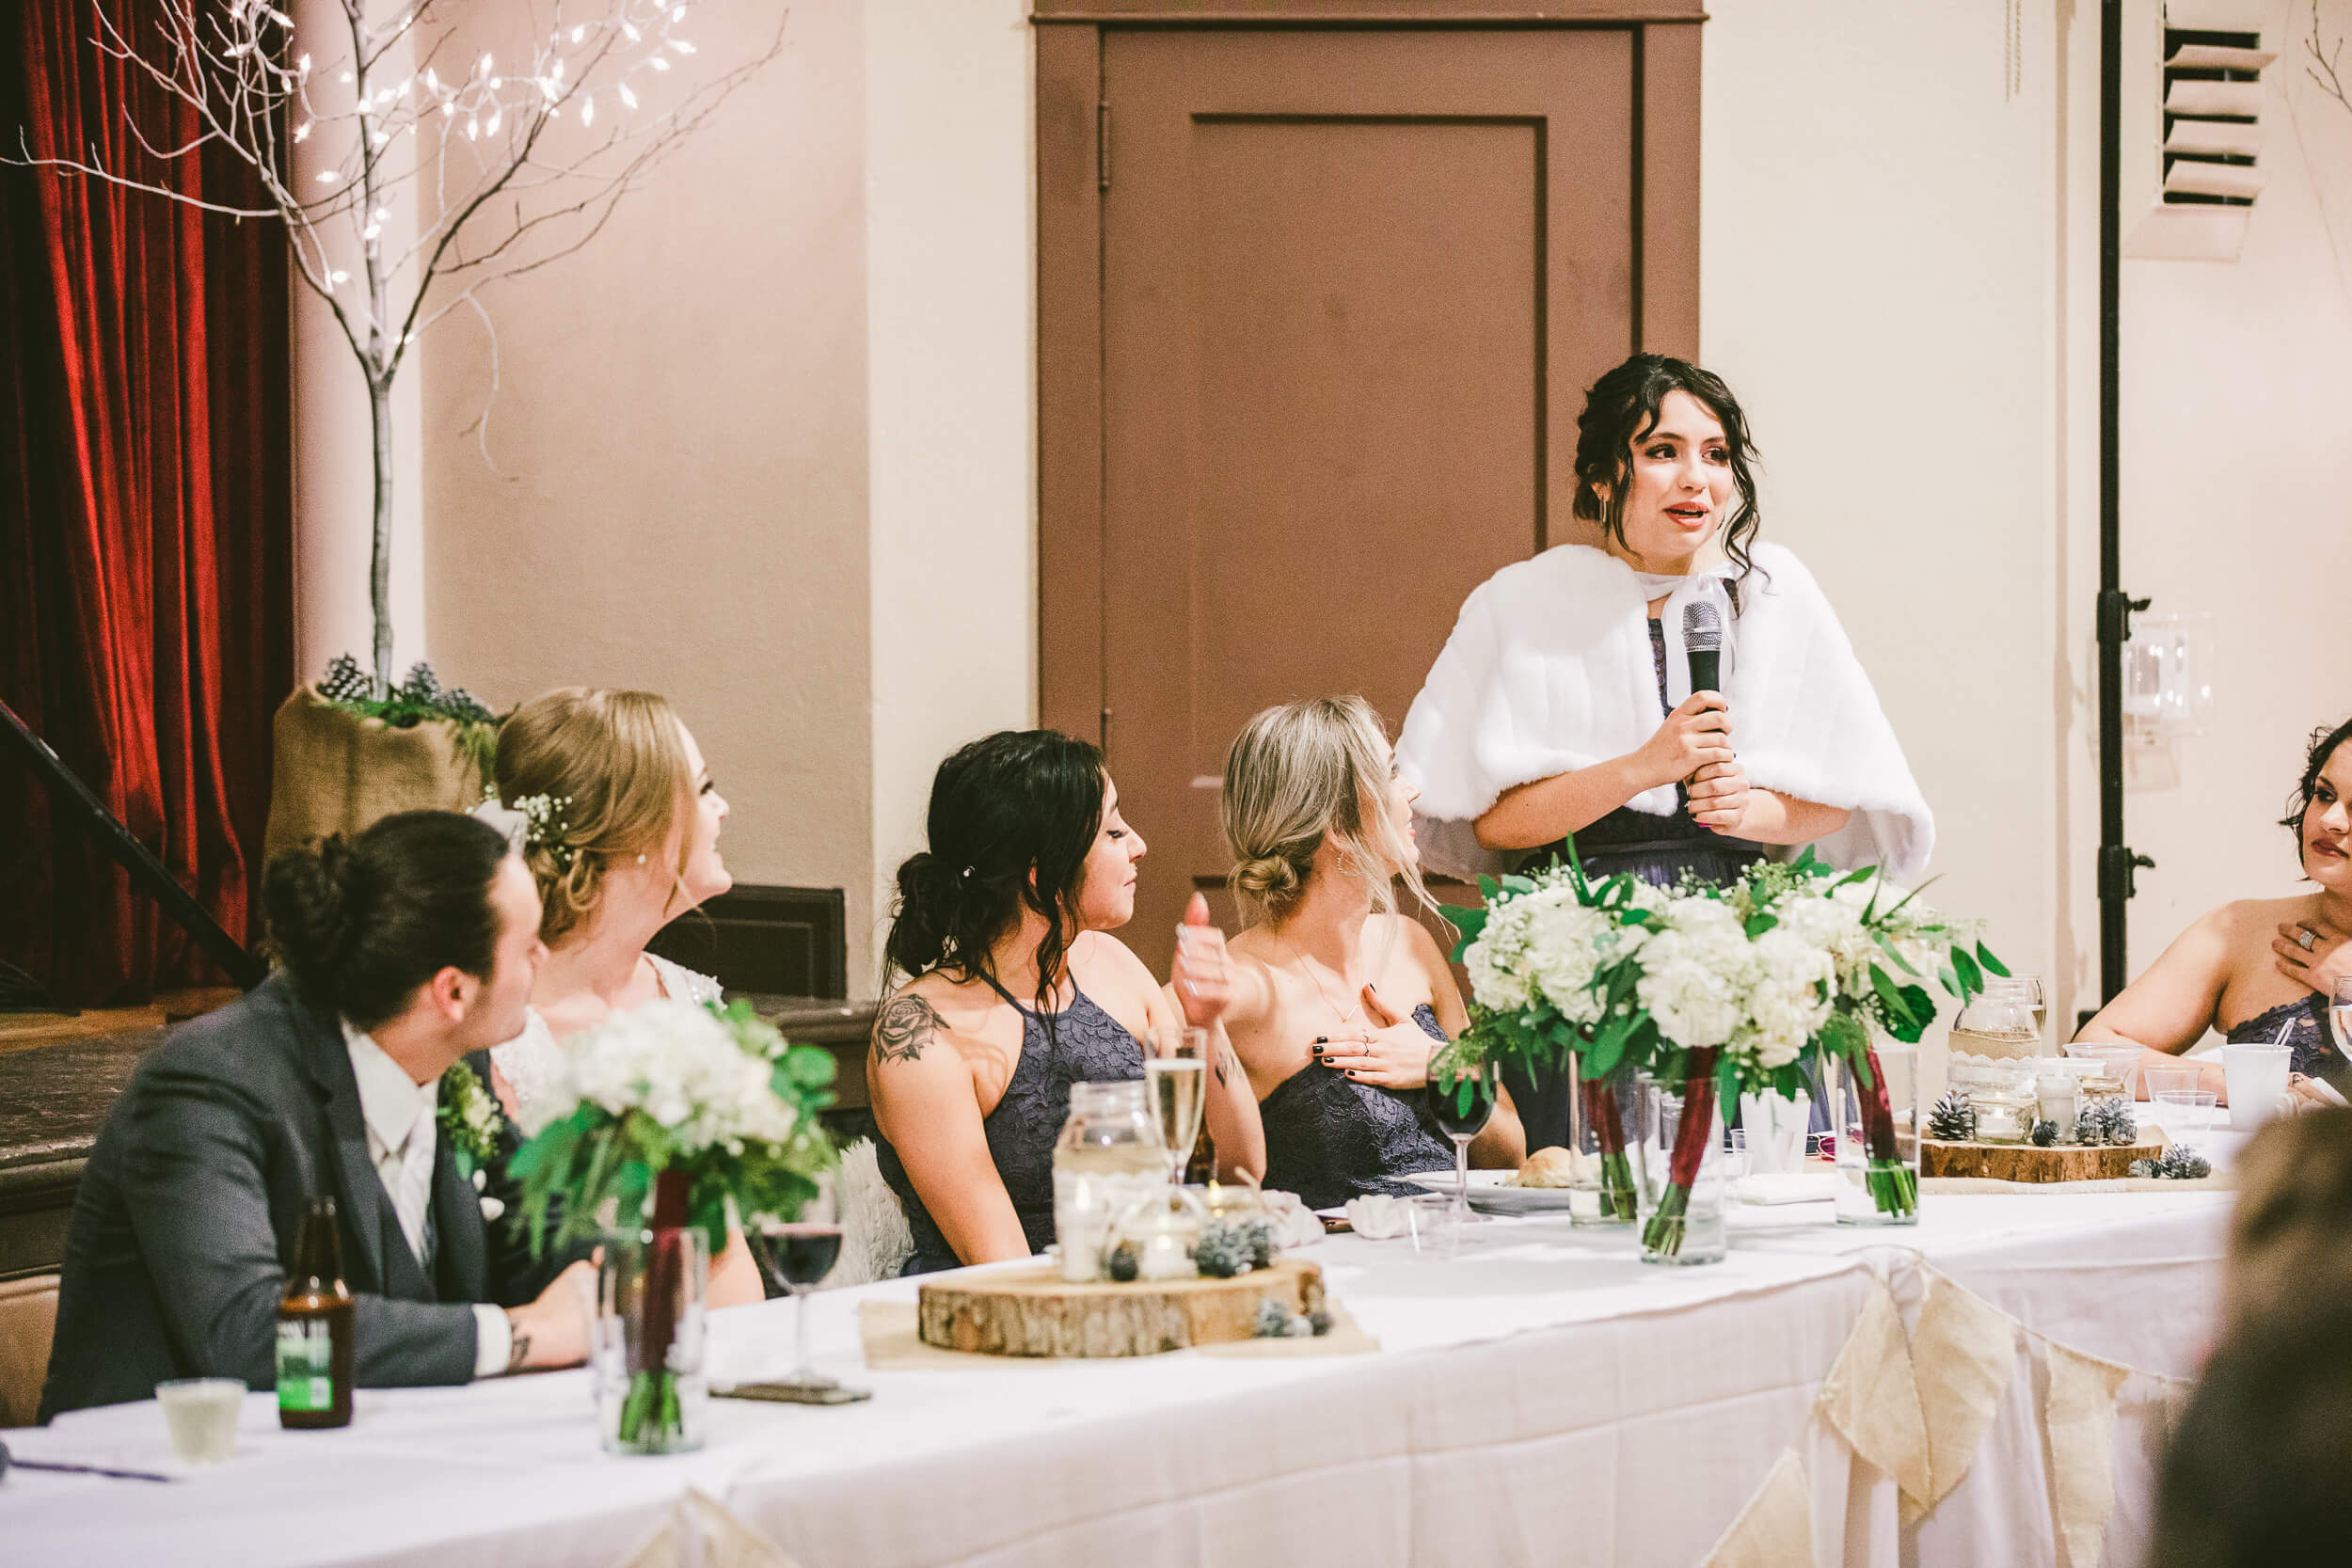 mukogawa winter wedding in spokane (252).jpg